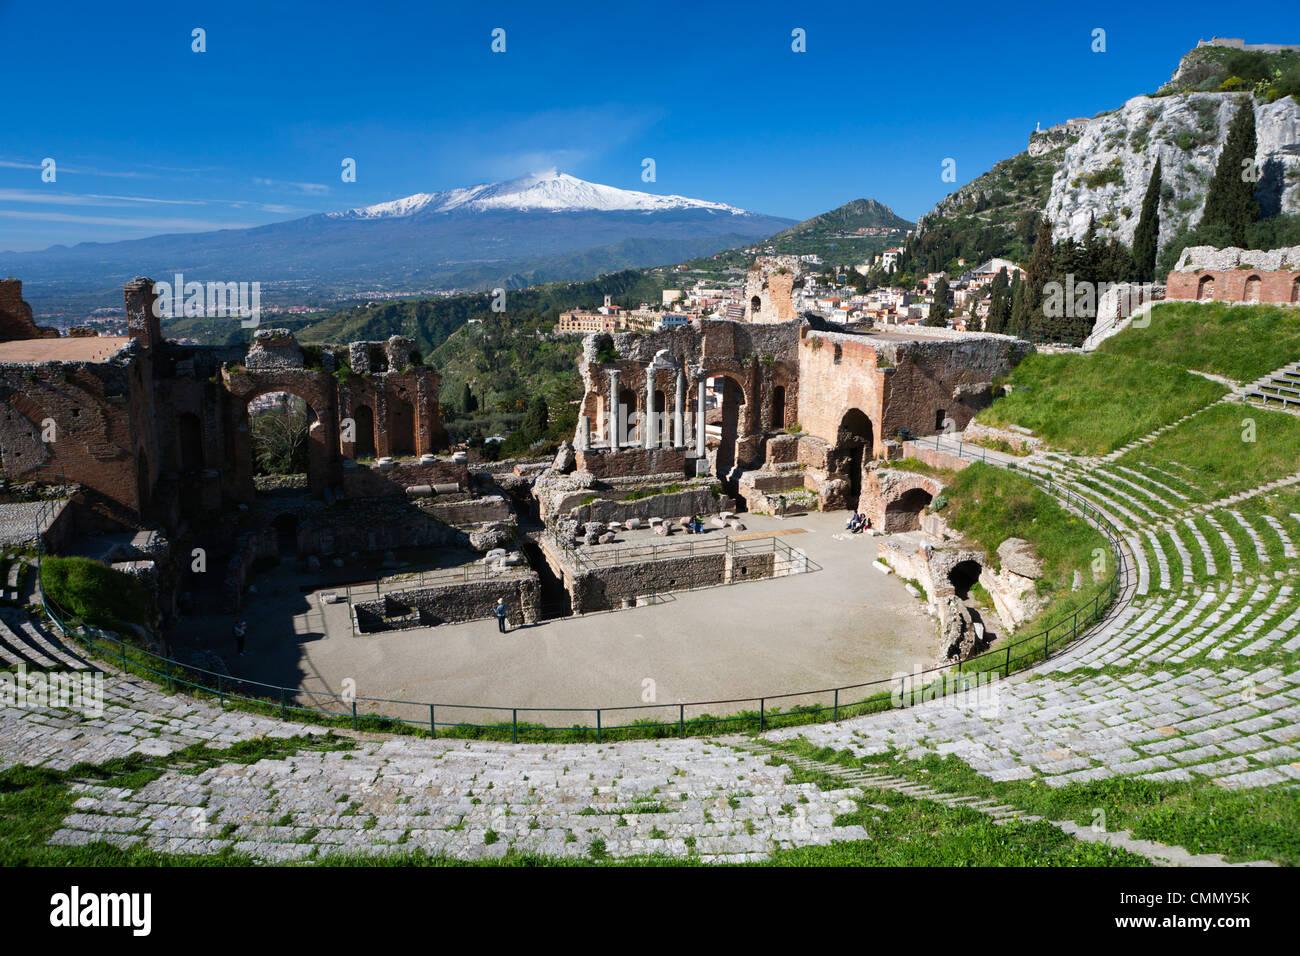 The Greek Amphitheatre and Mount Etna, Taormina, Sicily, Italy, Europe - Stock Image